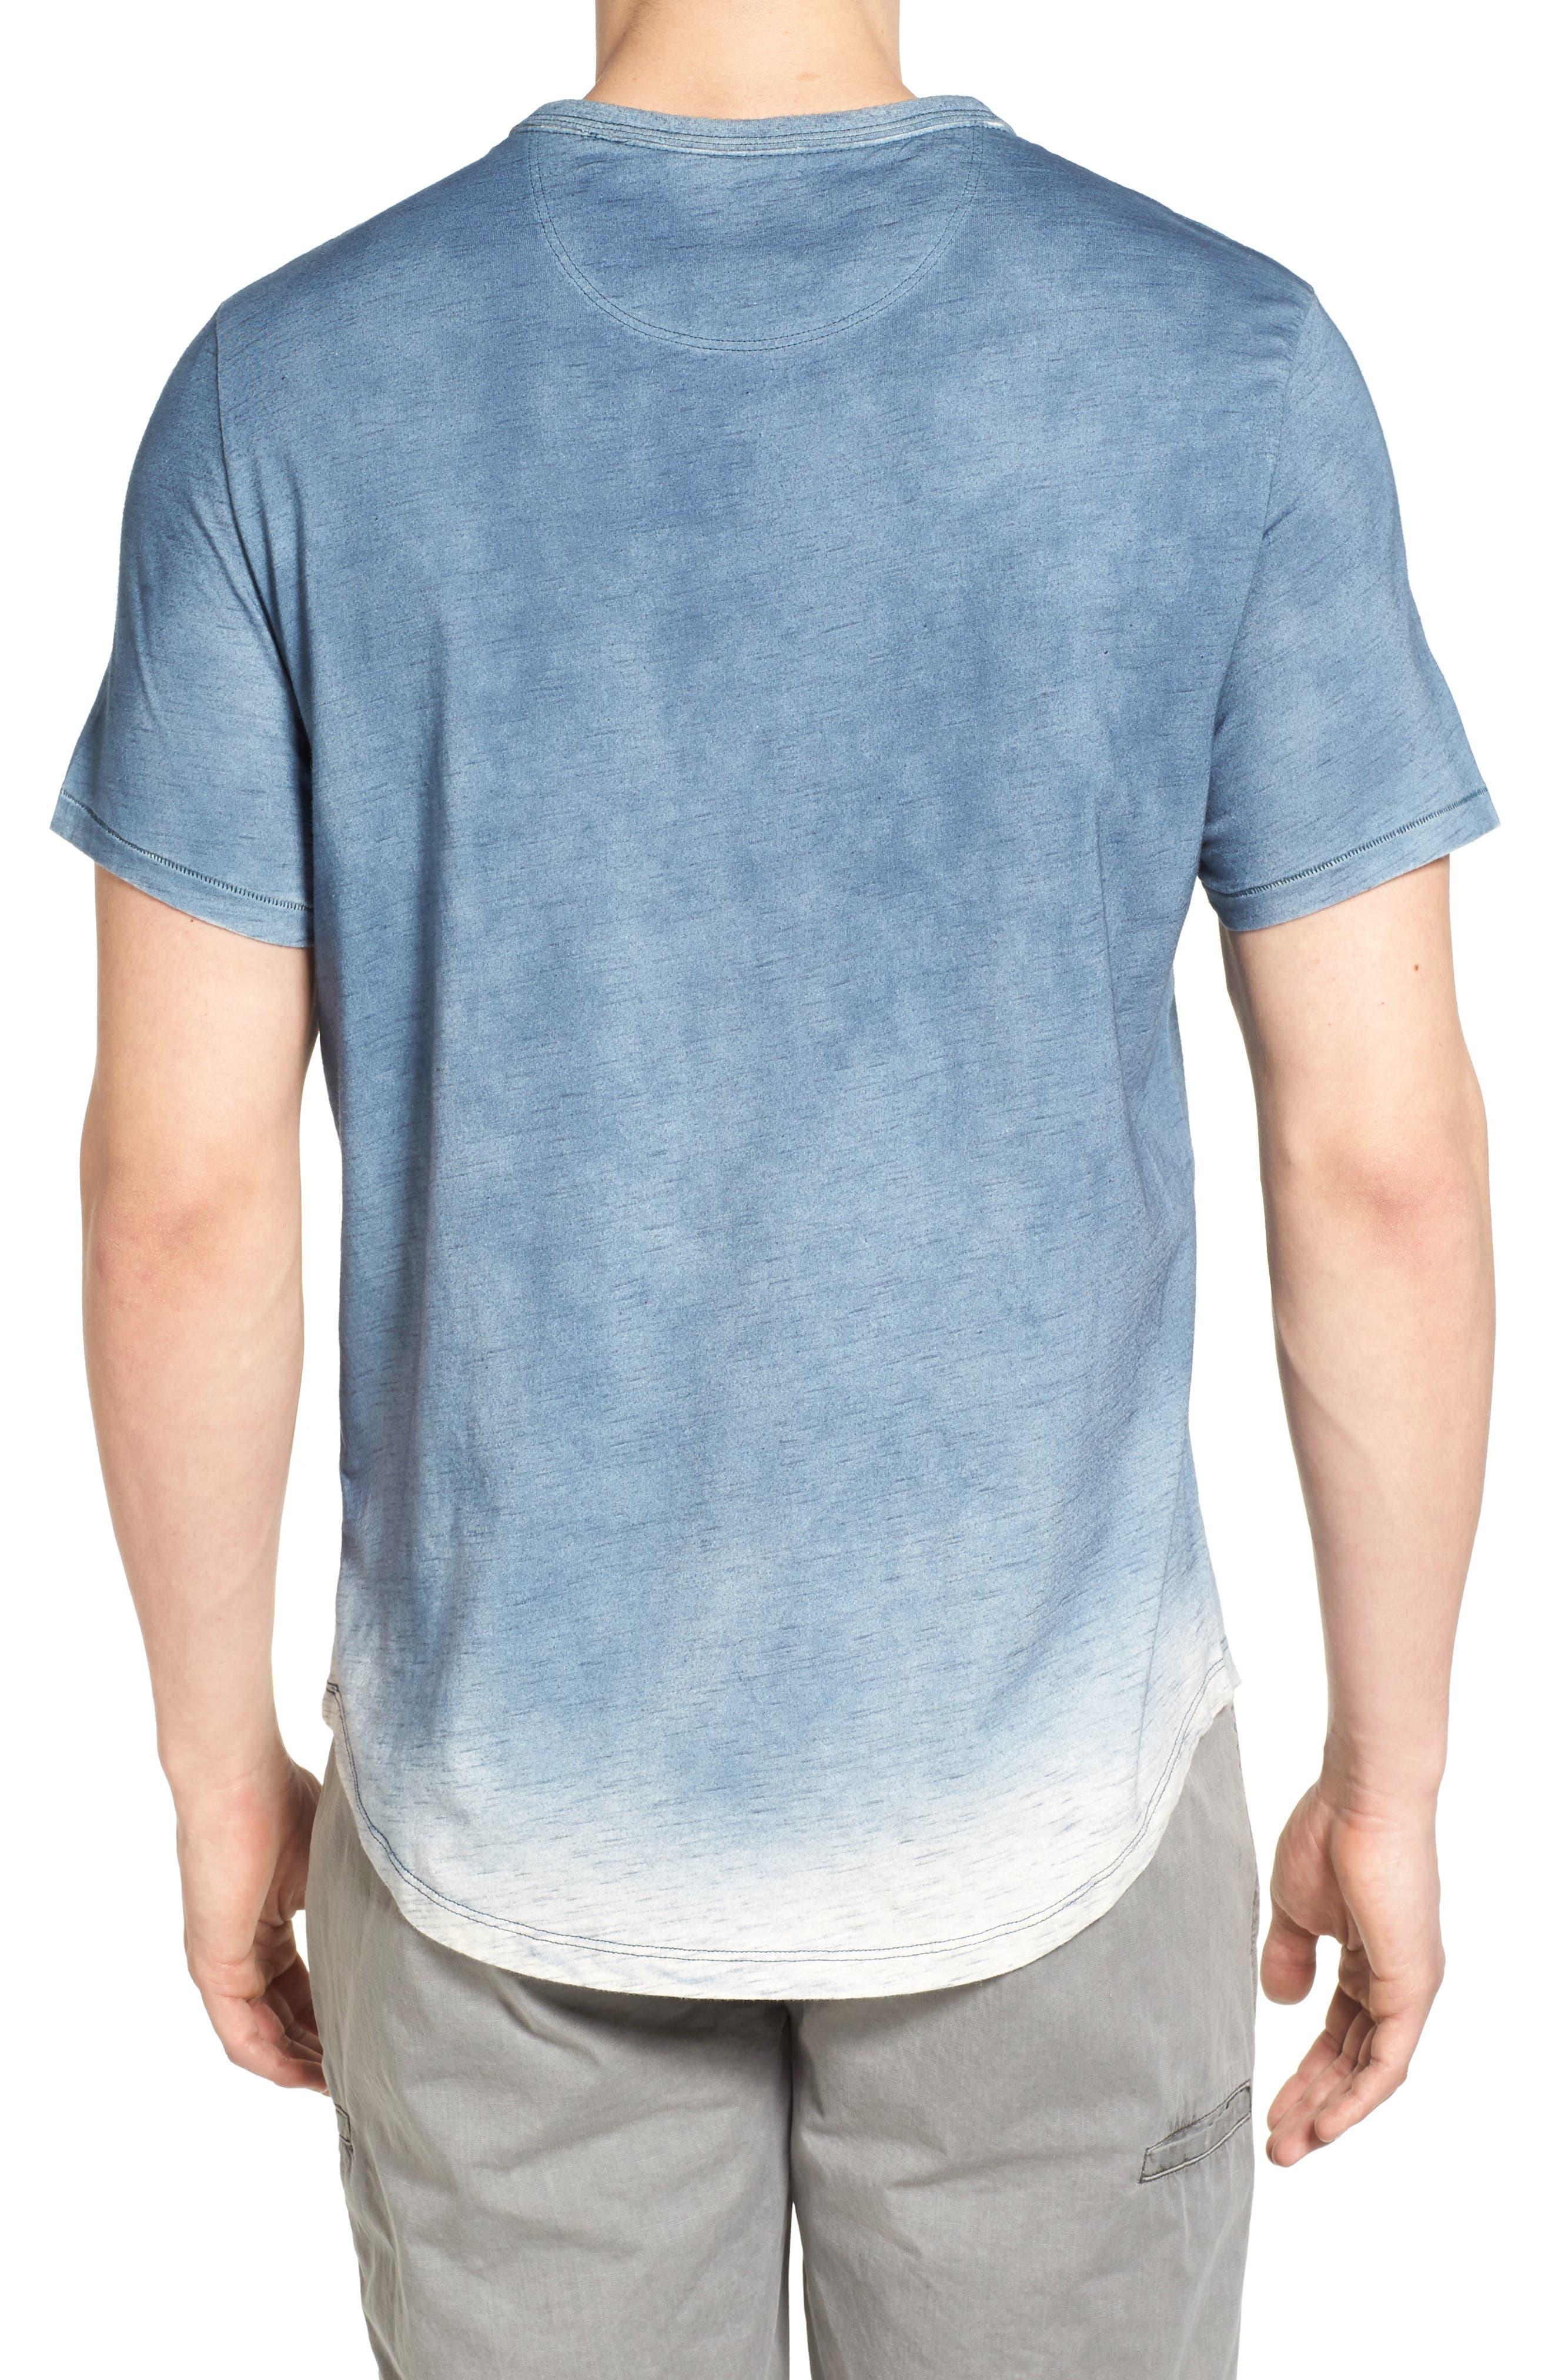 Alternate Image 2  - Jeremiah Kendrick Spray Heather Jersey T-Shirt